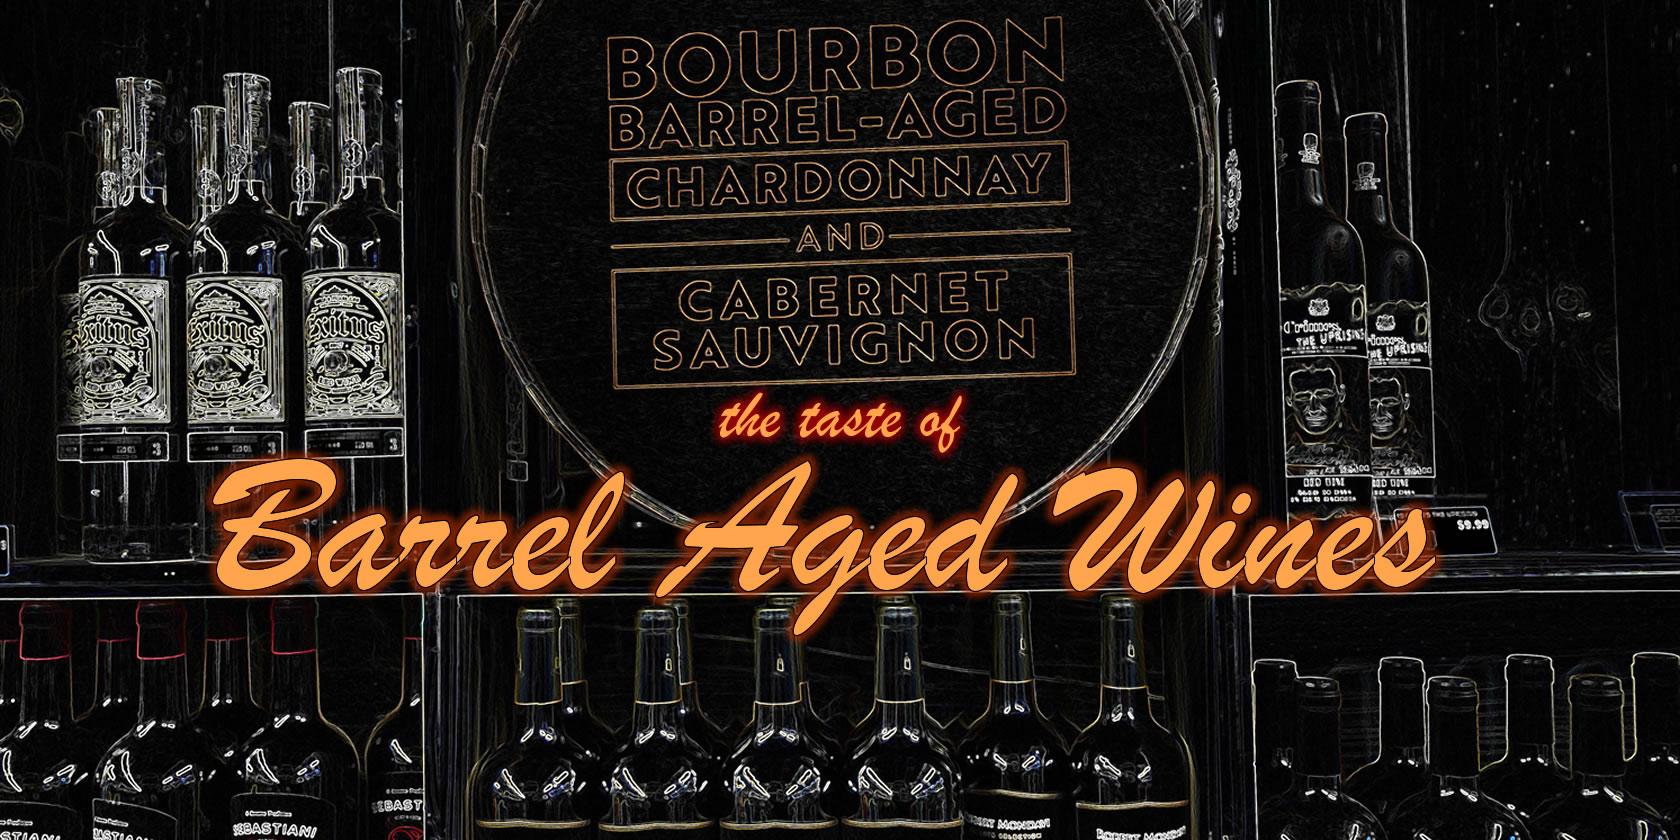 The Taste of Barrel Aged Wines